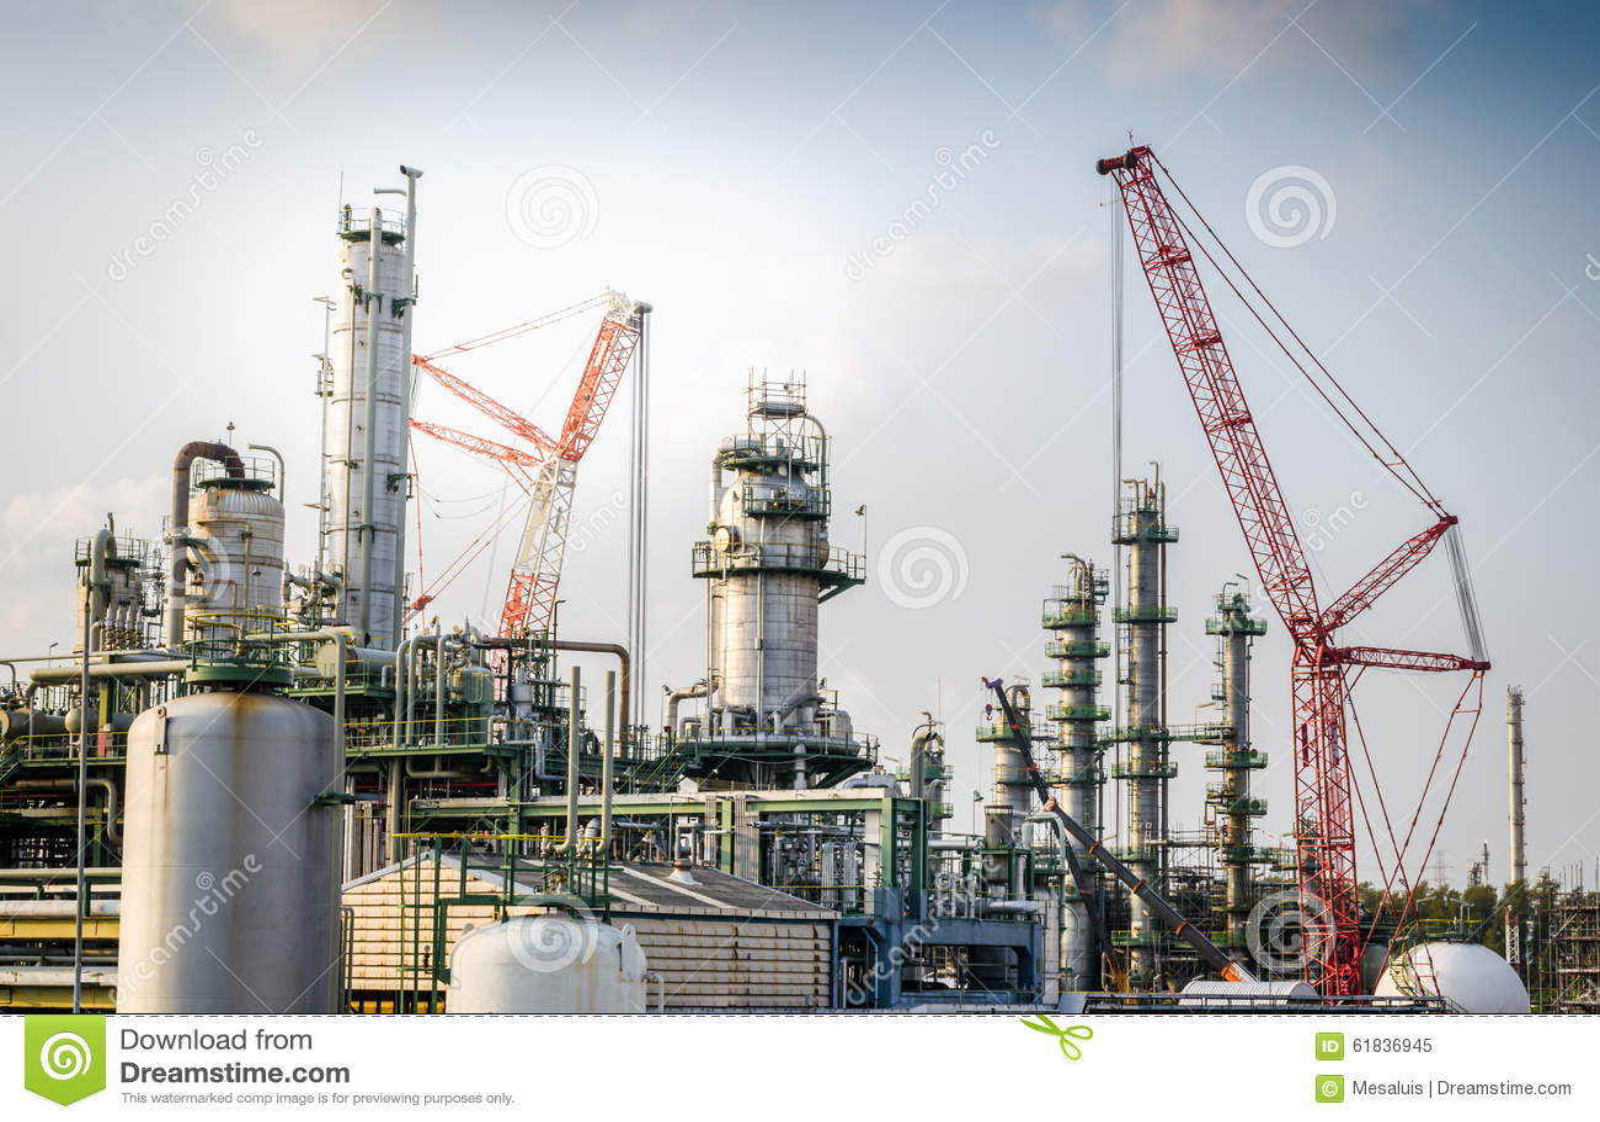 Maintenance Petrochemical Plant Stock Image - Image of